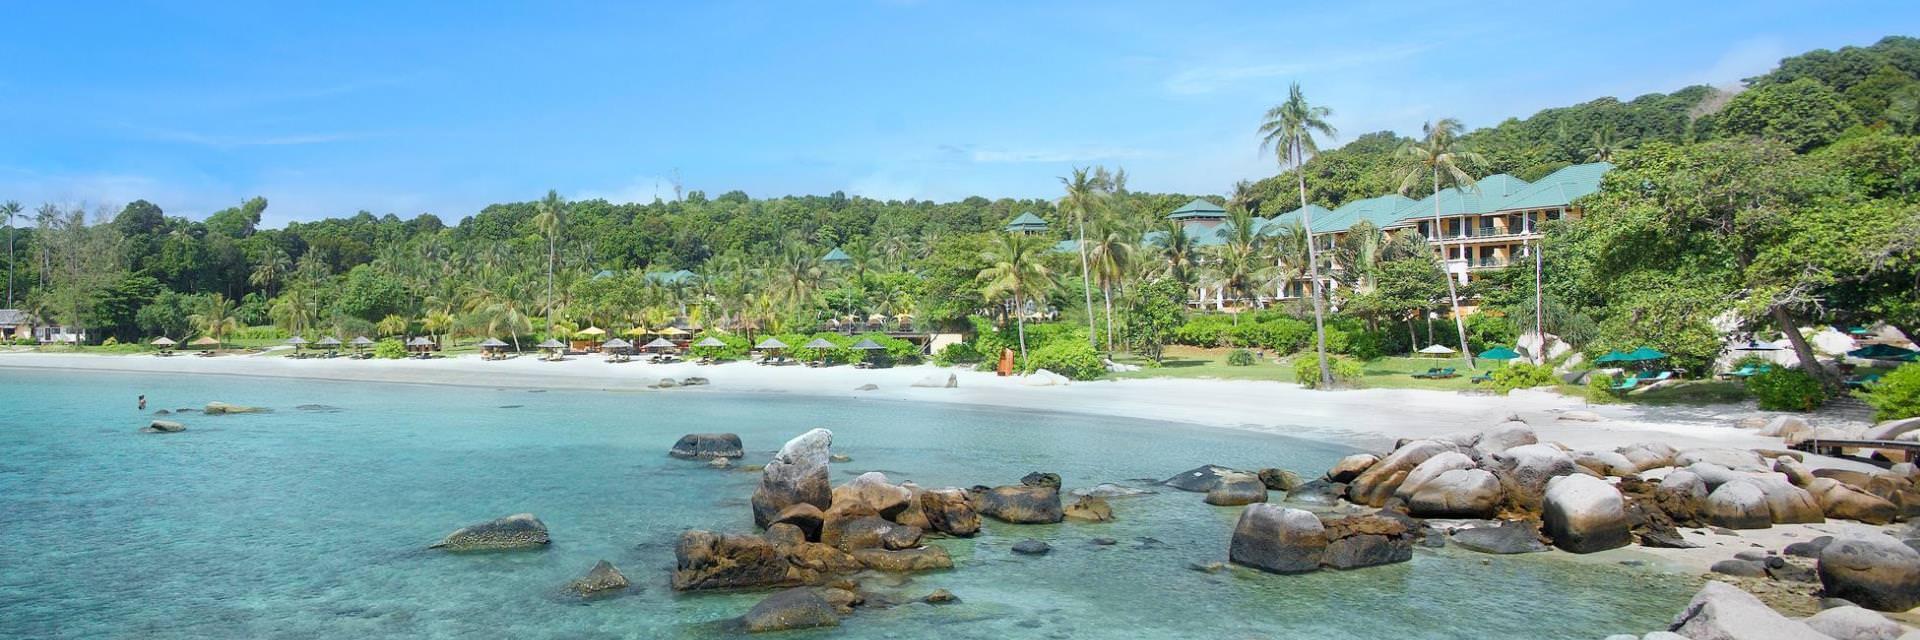 10 Wisata Wajib di Pulau Bintan 10 Wisata Wajib di Pulau Bintan - Dolan Dolen